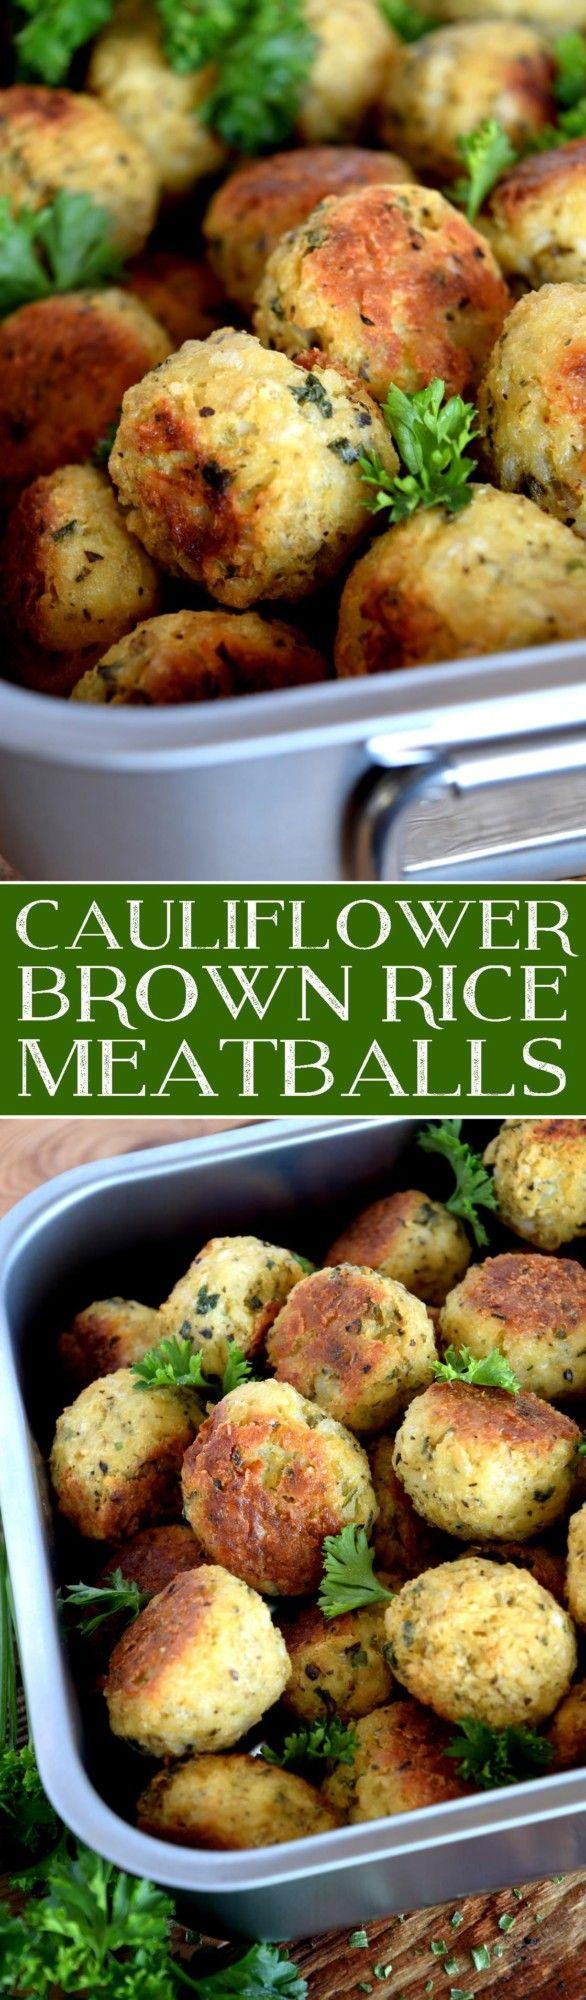 cauliflower-brown-rice-meatballs                                                                                                                                                                                 More